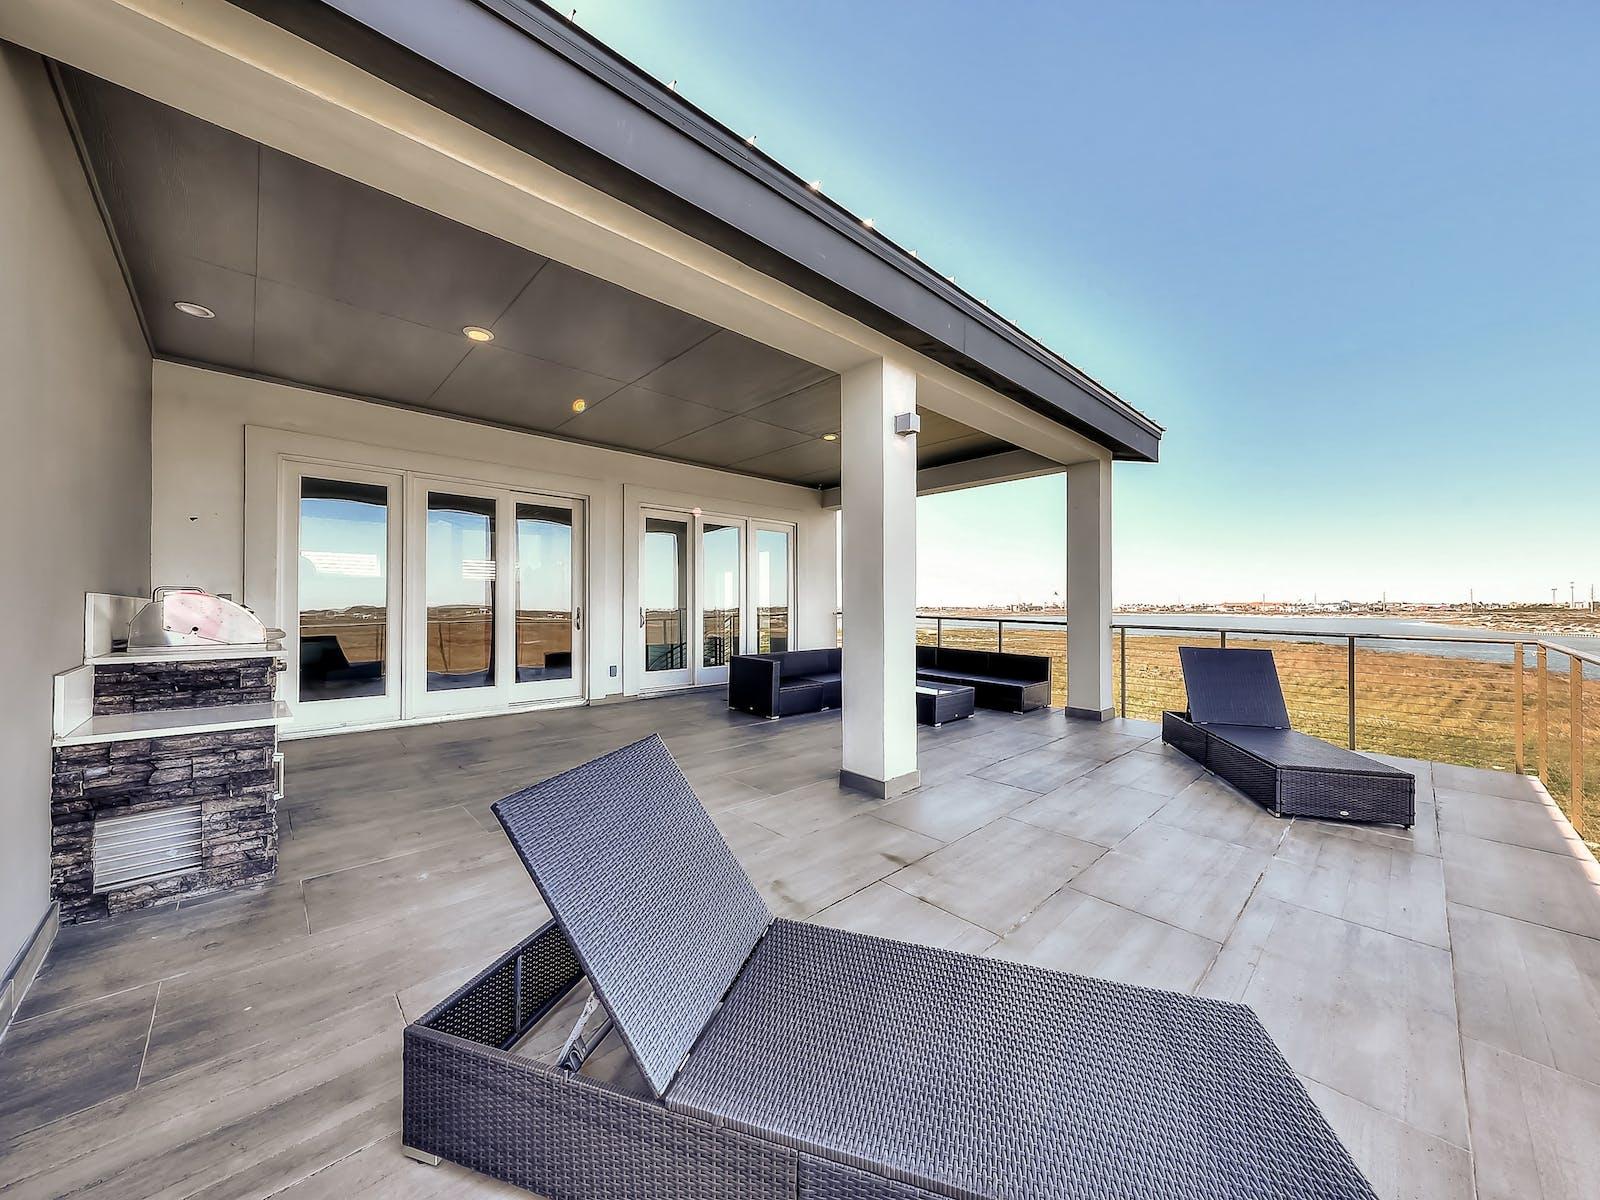 corpus christi beach house with large patio